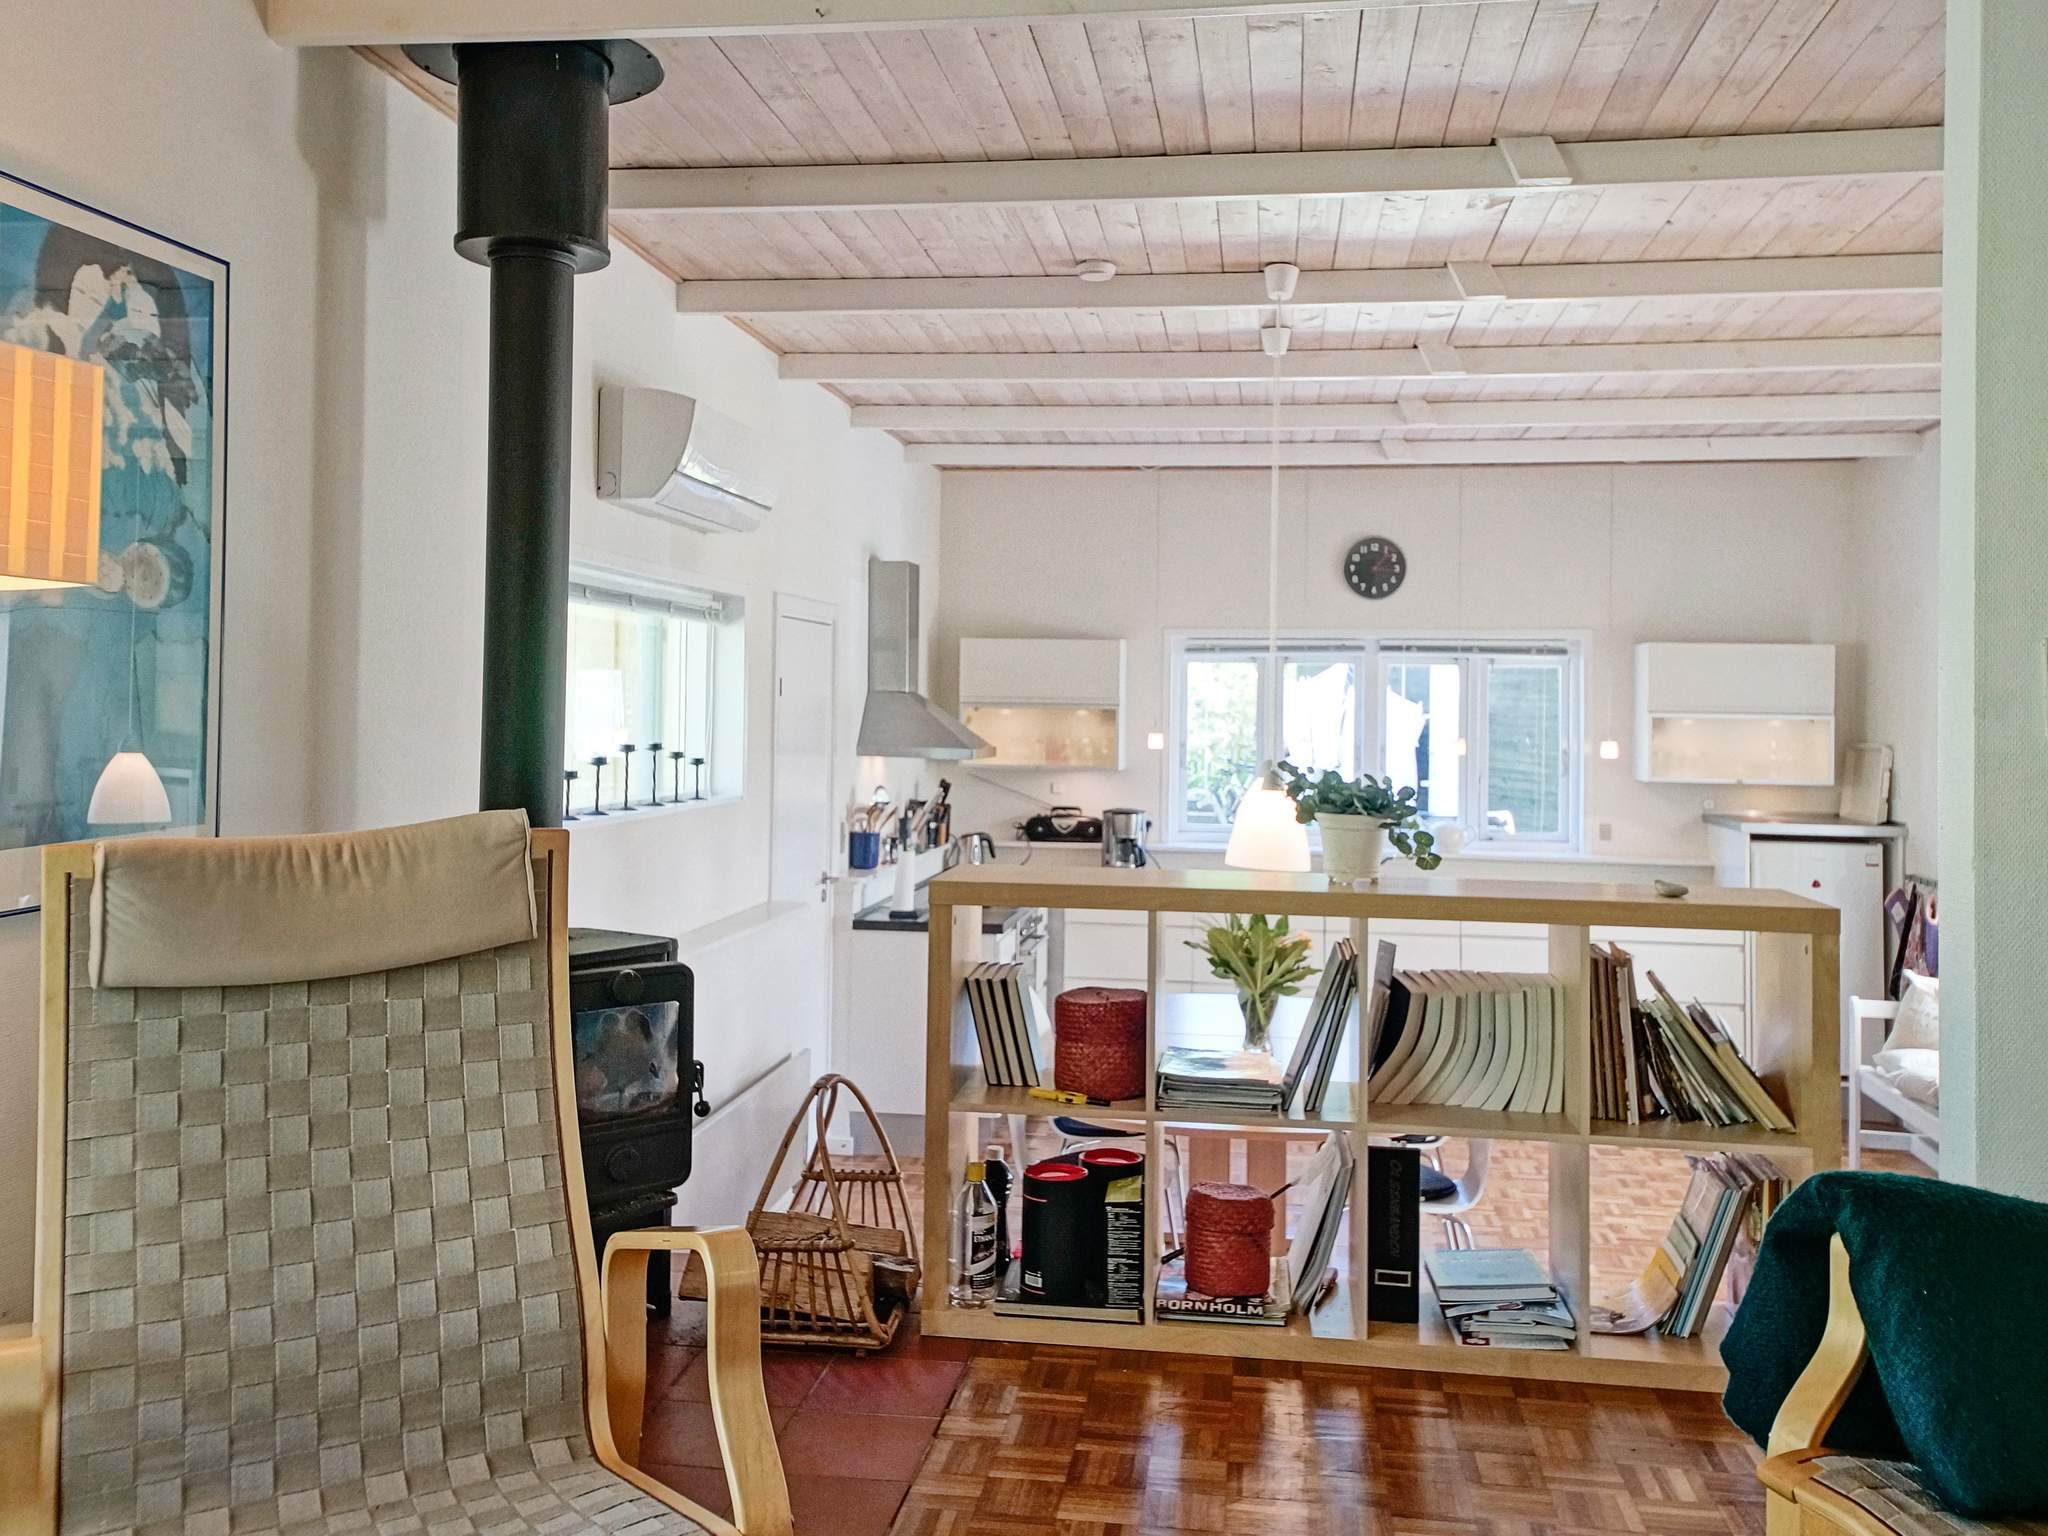 Ferienhaus Balka Strand (82258), Balke, , Bornholm, Dänemark, Bild 9